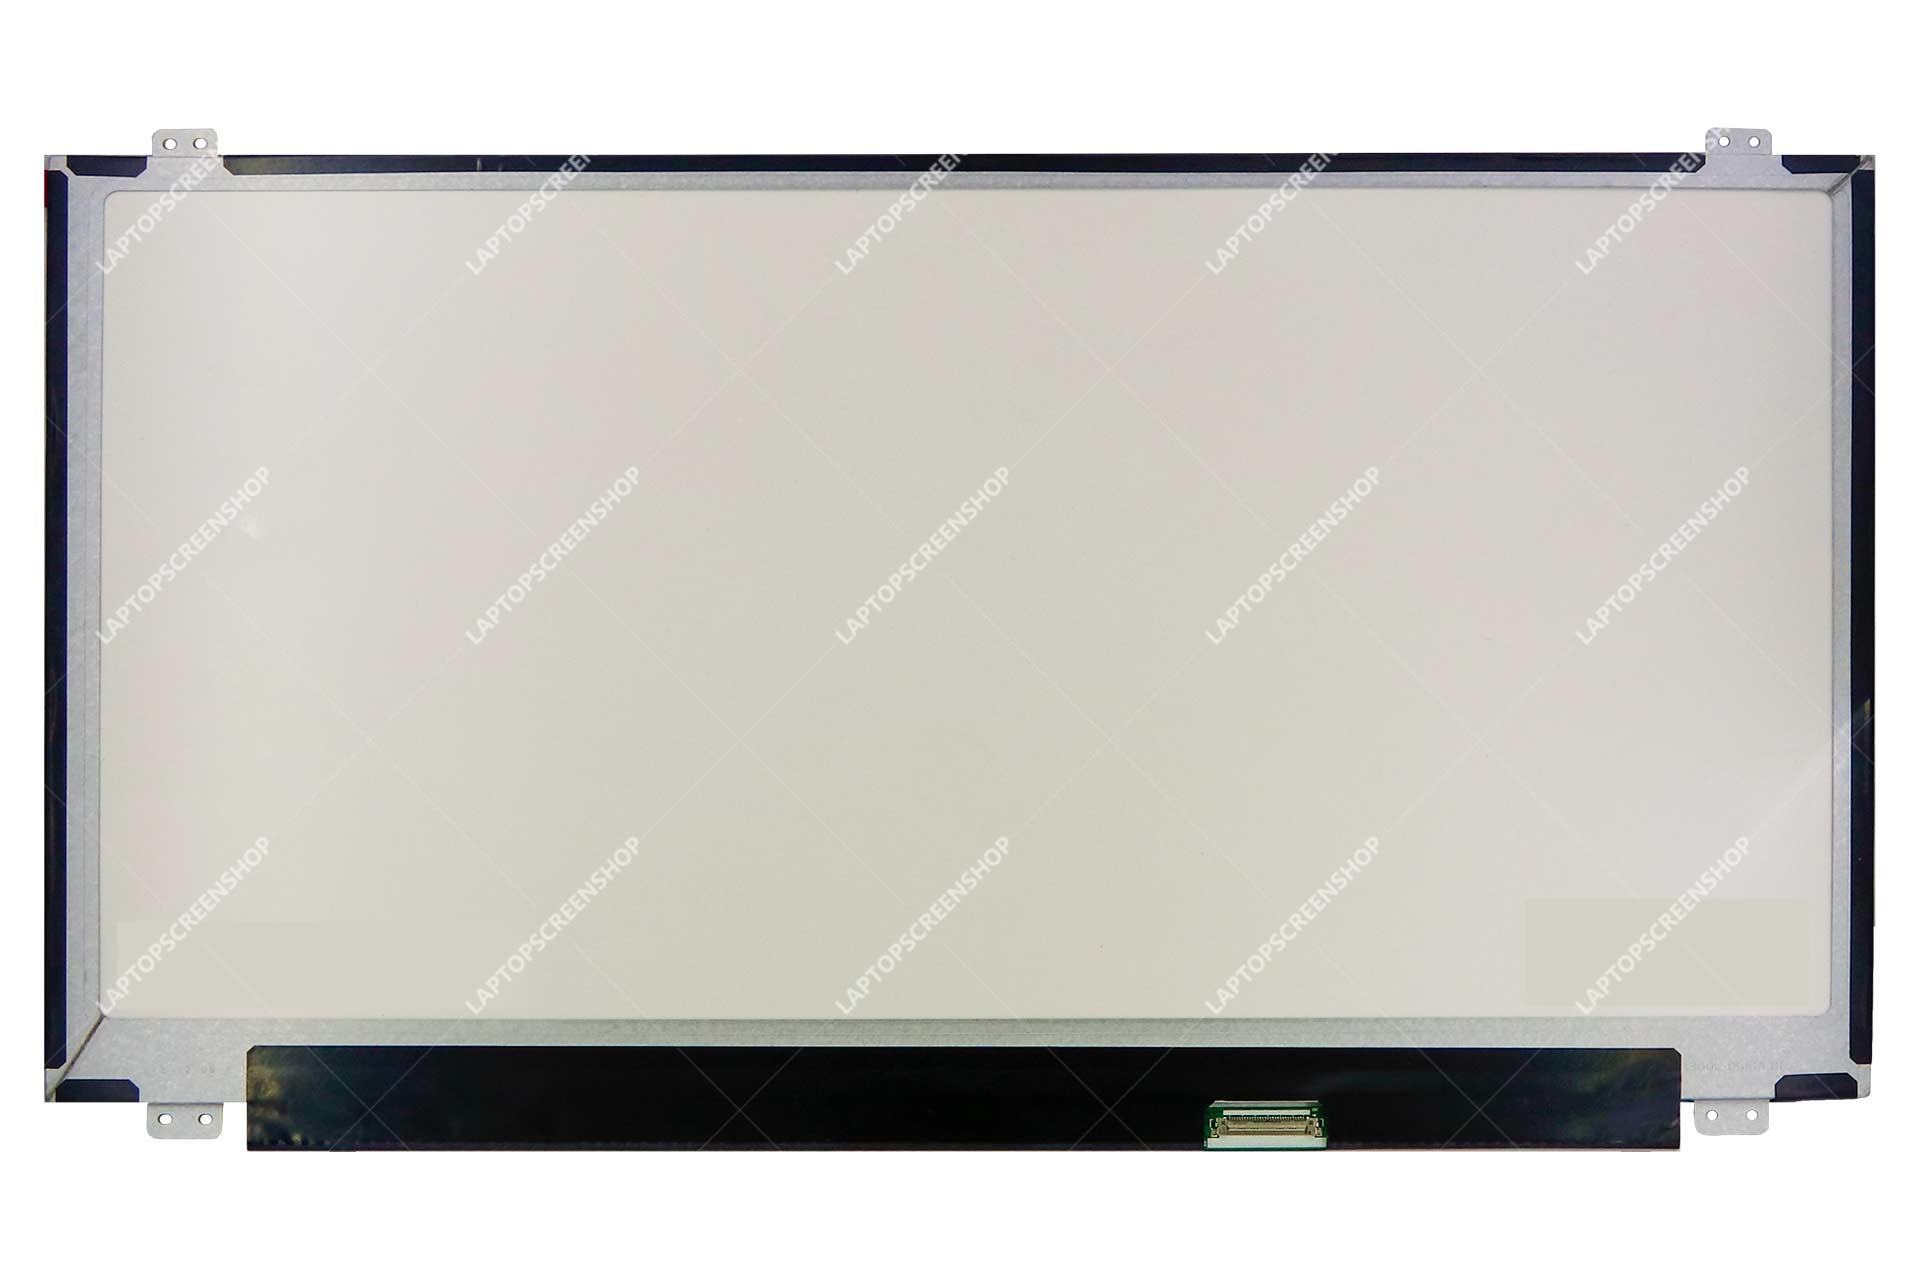 ACER-ASPIRE-E1-522-5659-LCD |HD|فروشگاه لپ تاپ اسکرين | تعمير لپ تاپ